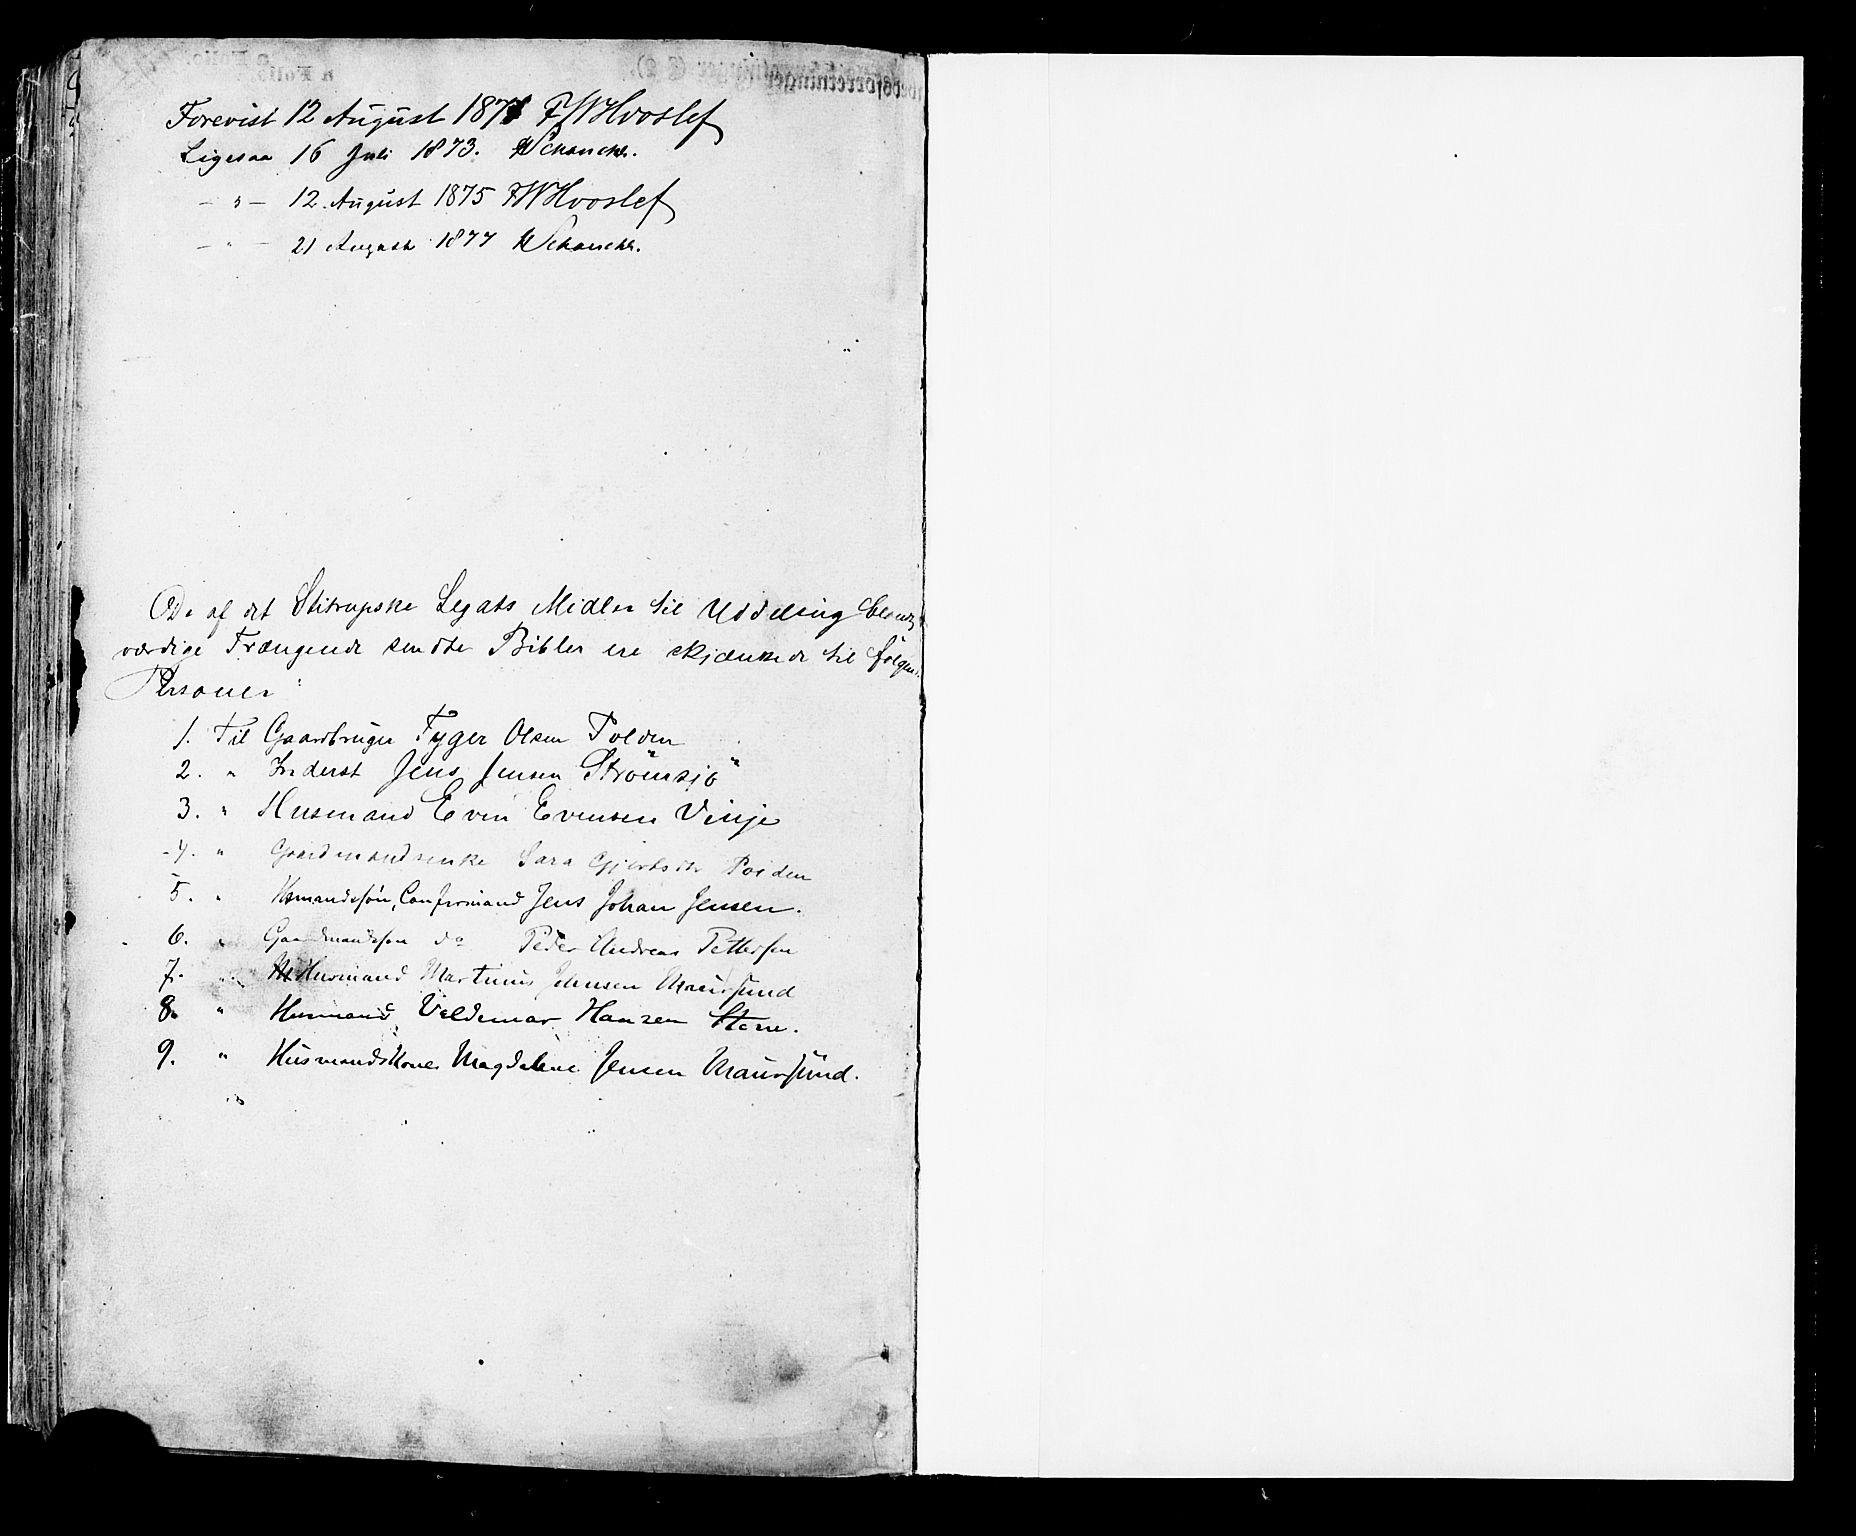 SAT, Ministerialprotokoller, klokkerbøker og fødselsregistre - Nordland, 891/L1301: Ministerialbok nr. 891A06, 1870-1878